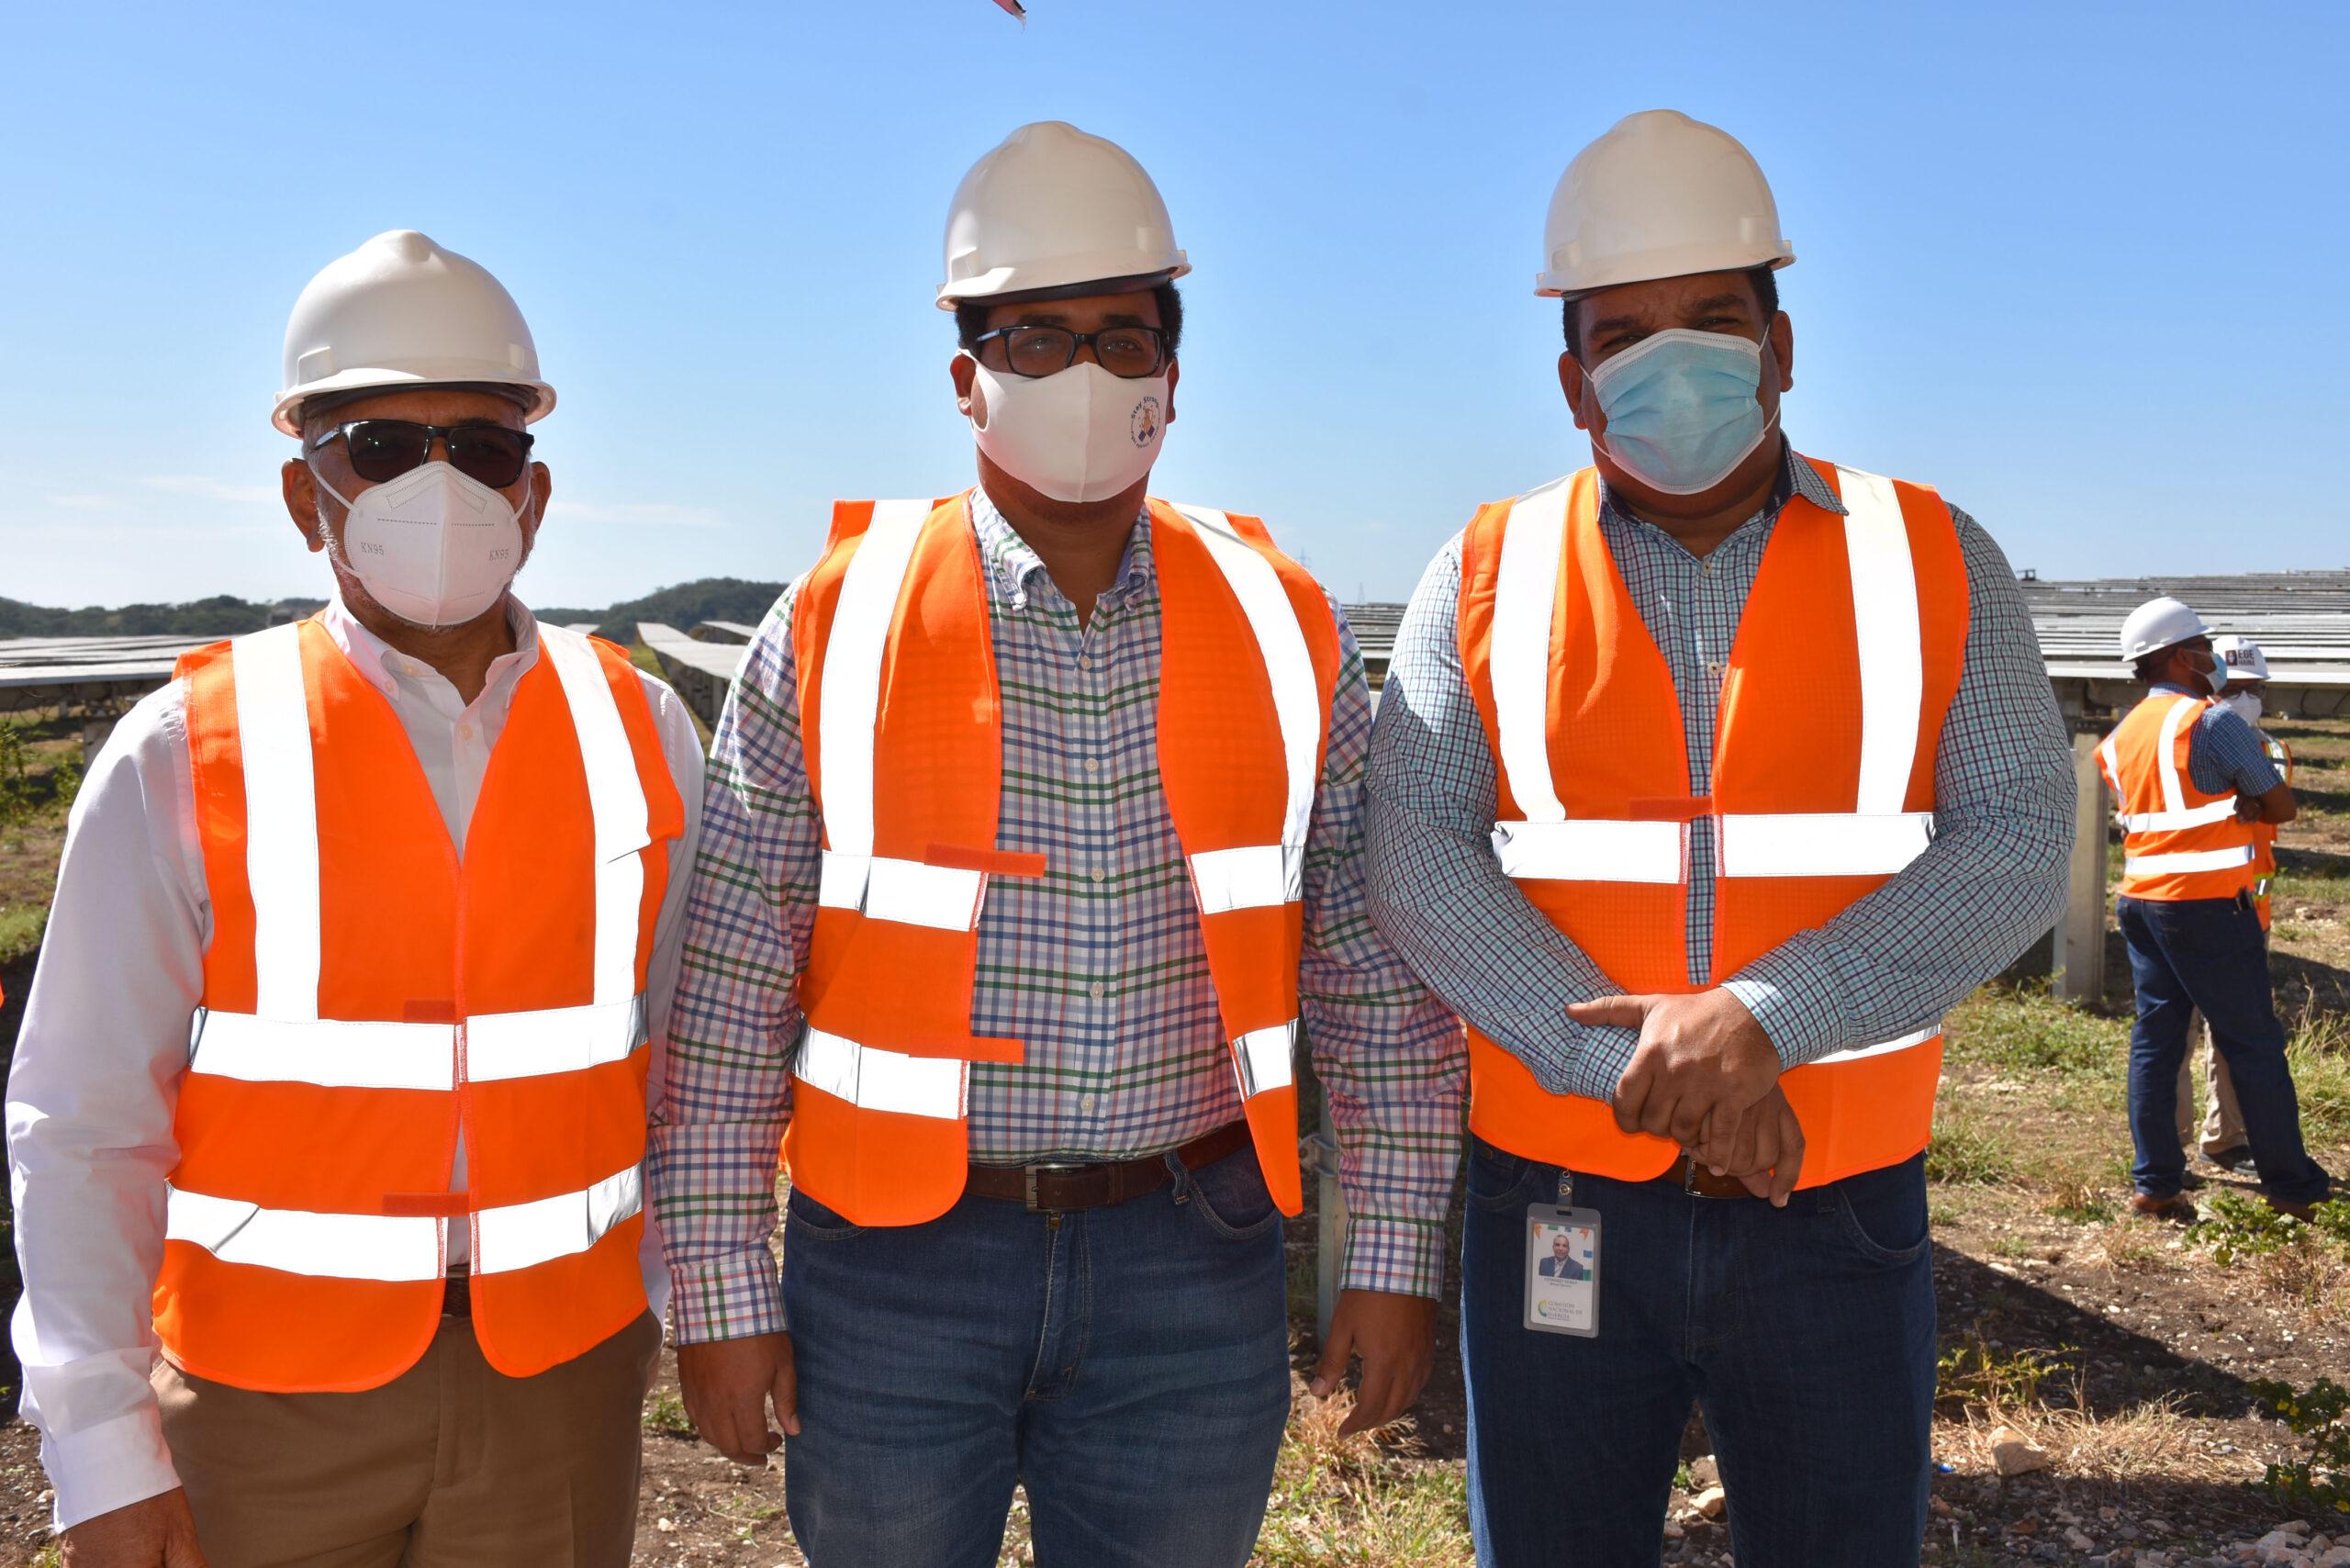 Viceministro de Energía visita proyecto fotovoltaico Girasol